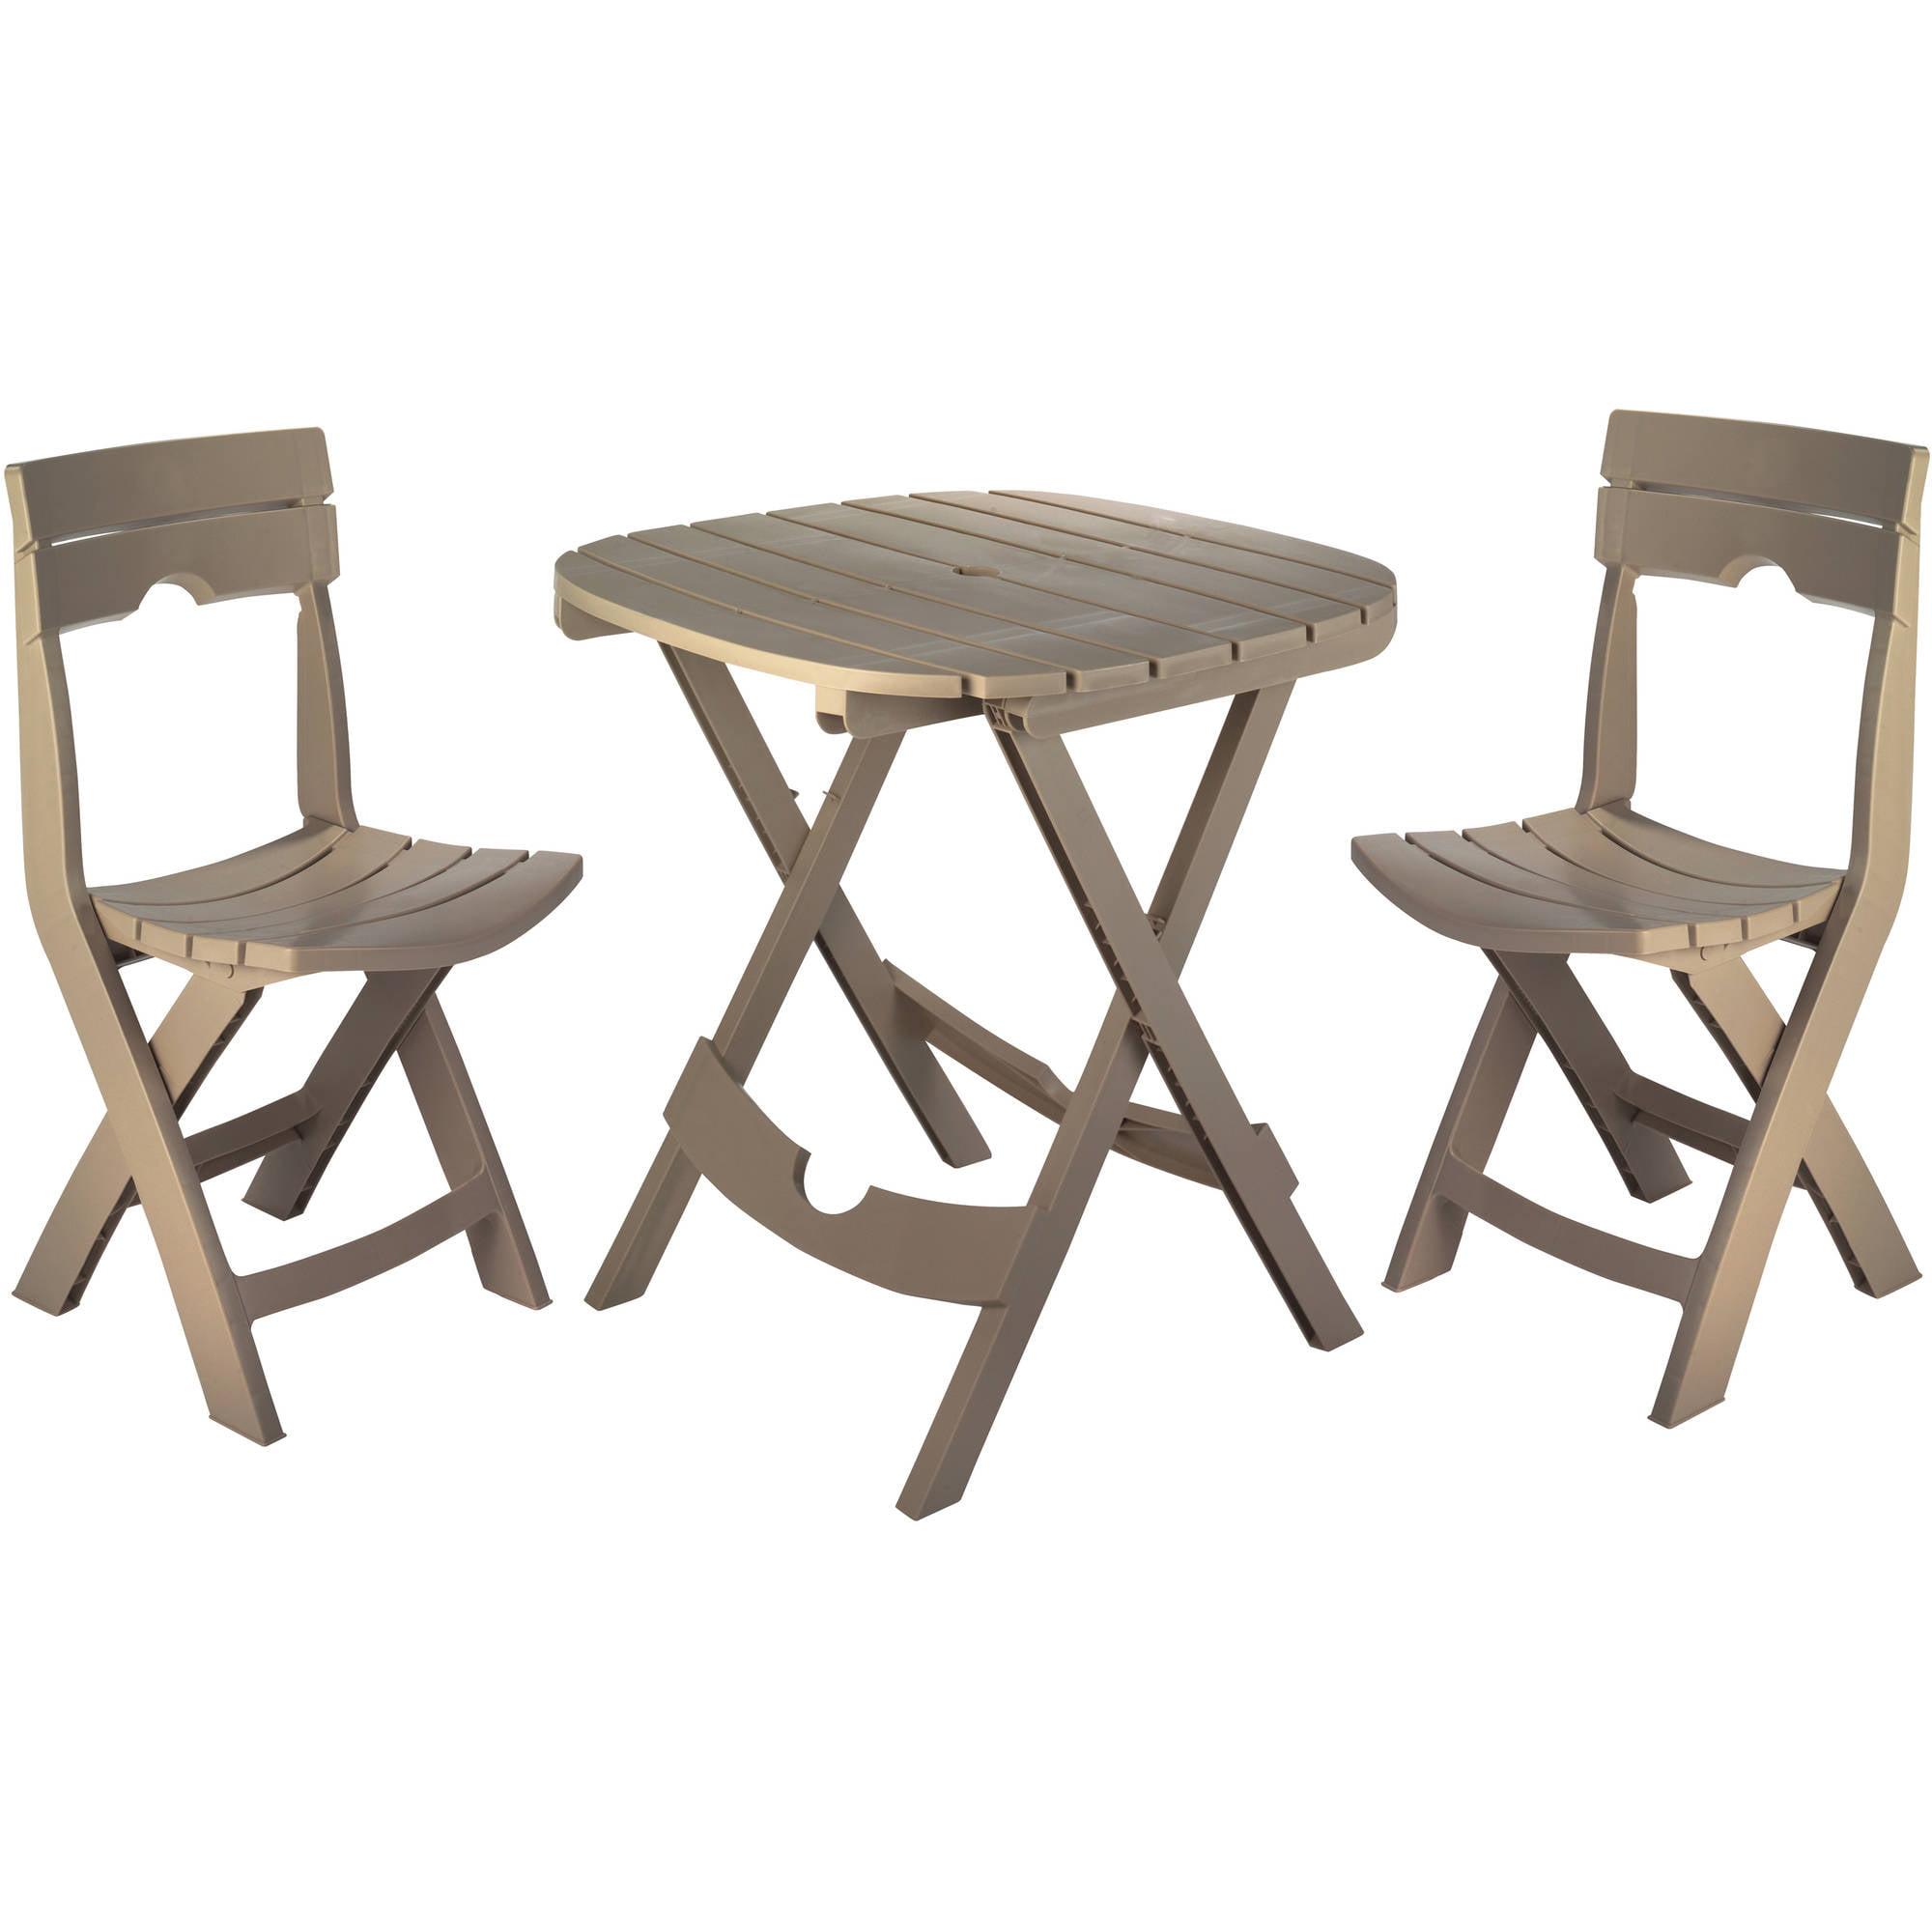 Image of Adams Manufacturing Resin Quik-Fold Cafe Set, Portobello